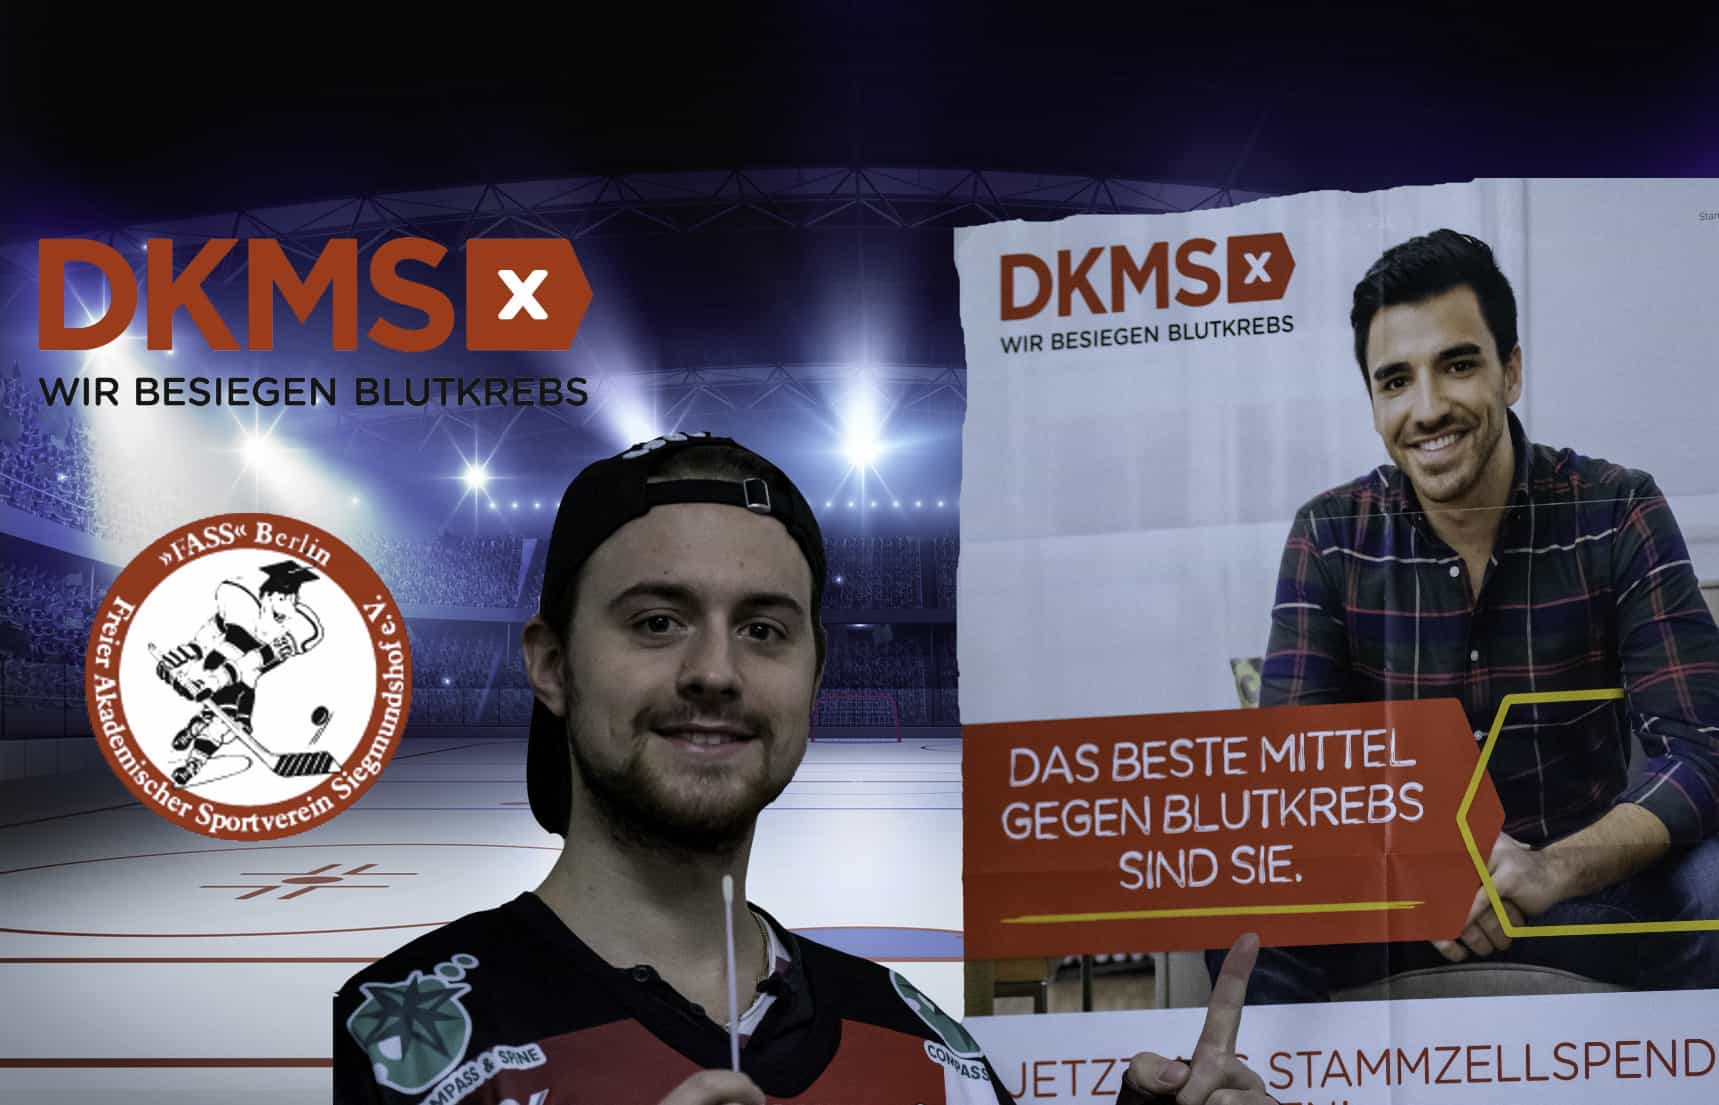 2018-10-24 Jentzsch DKMS